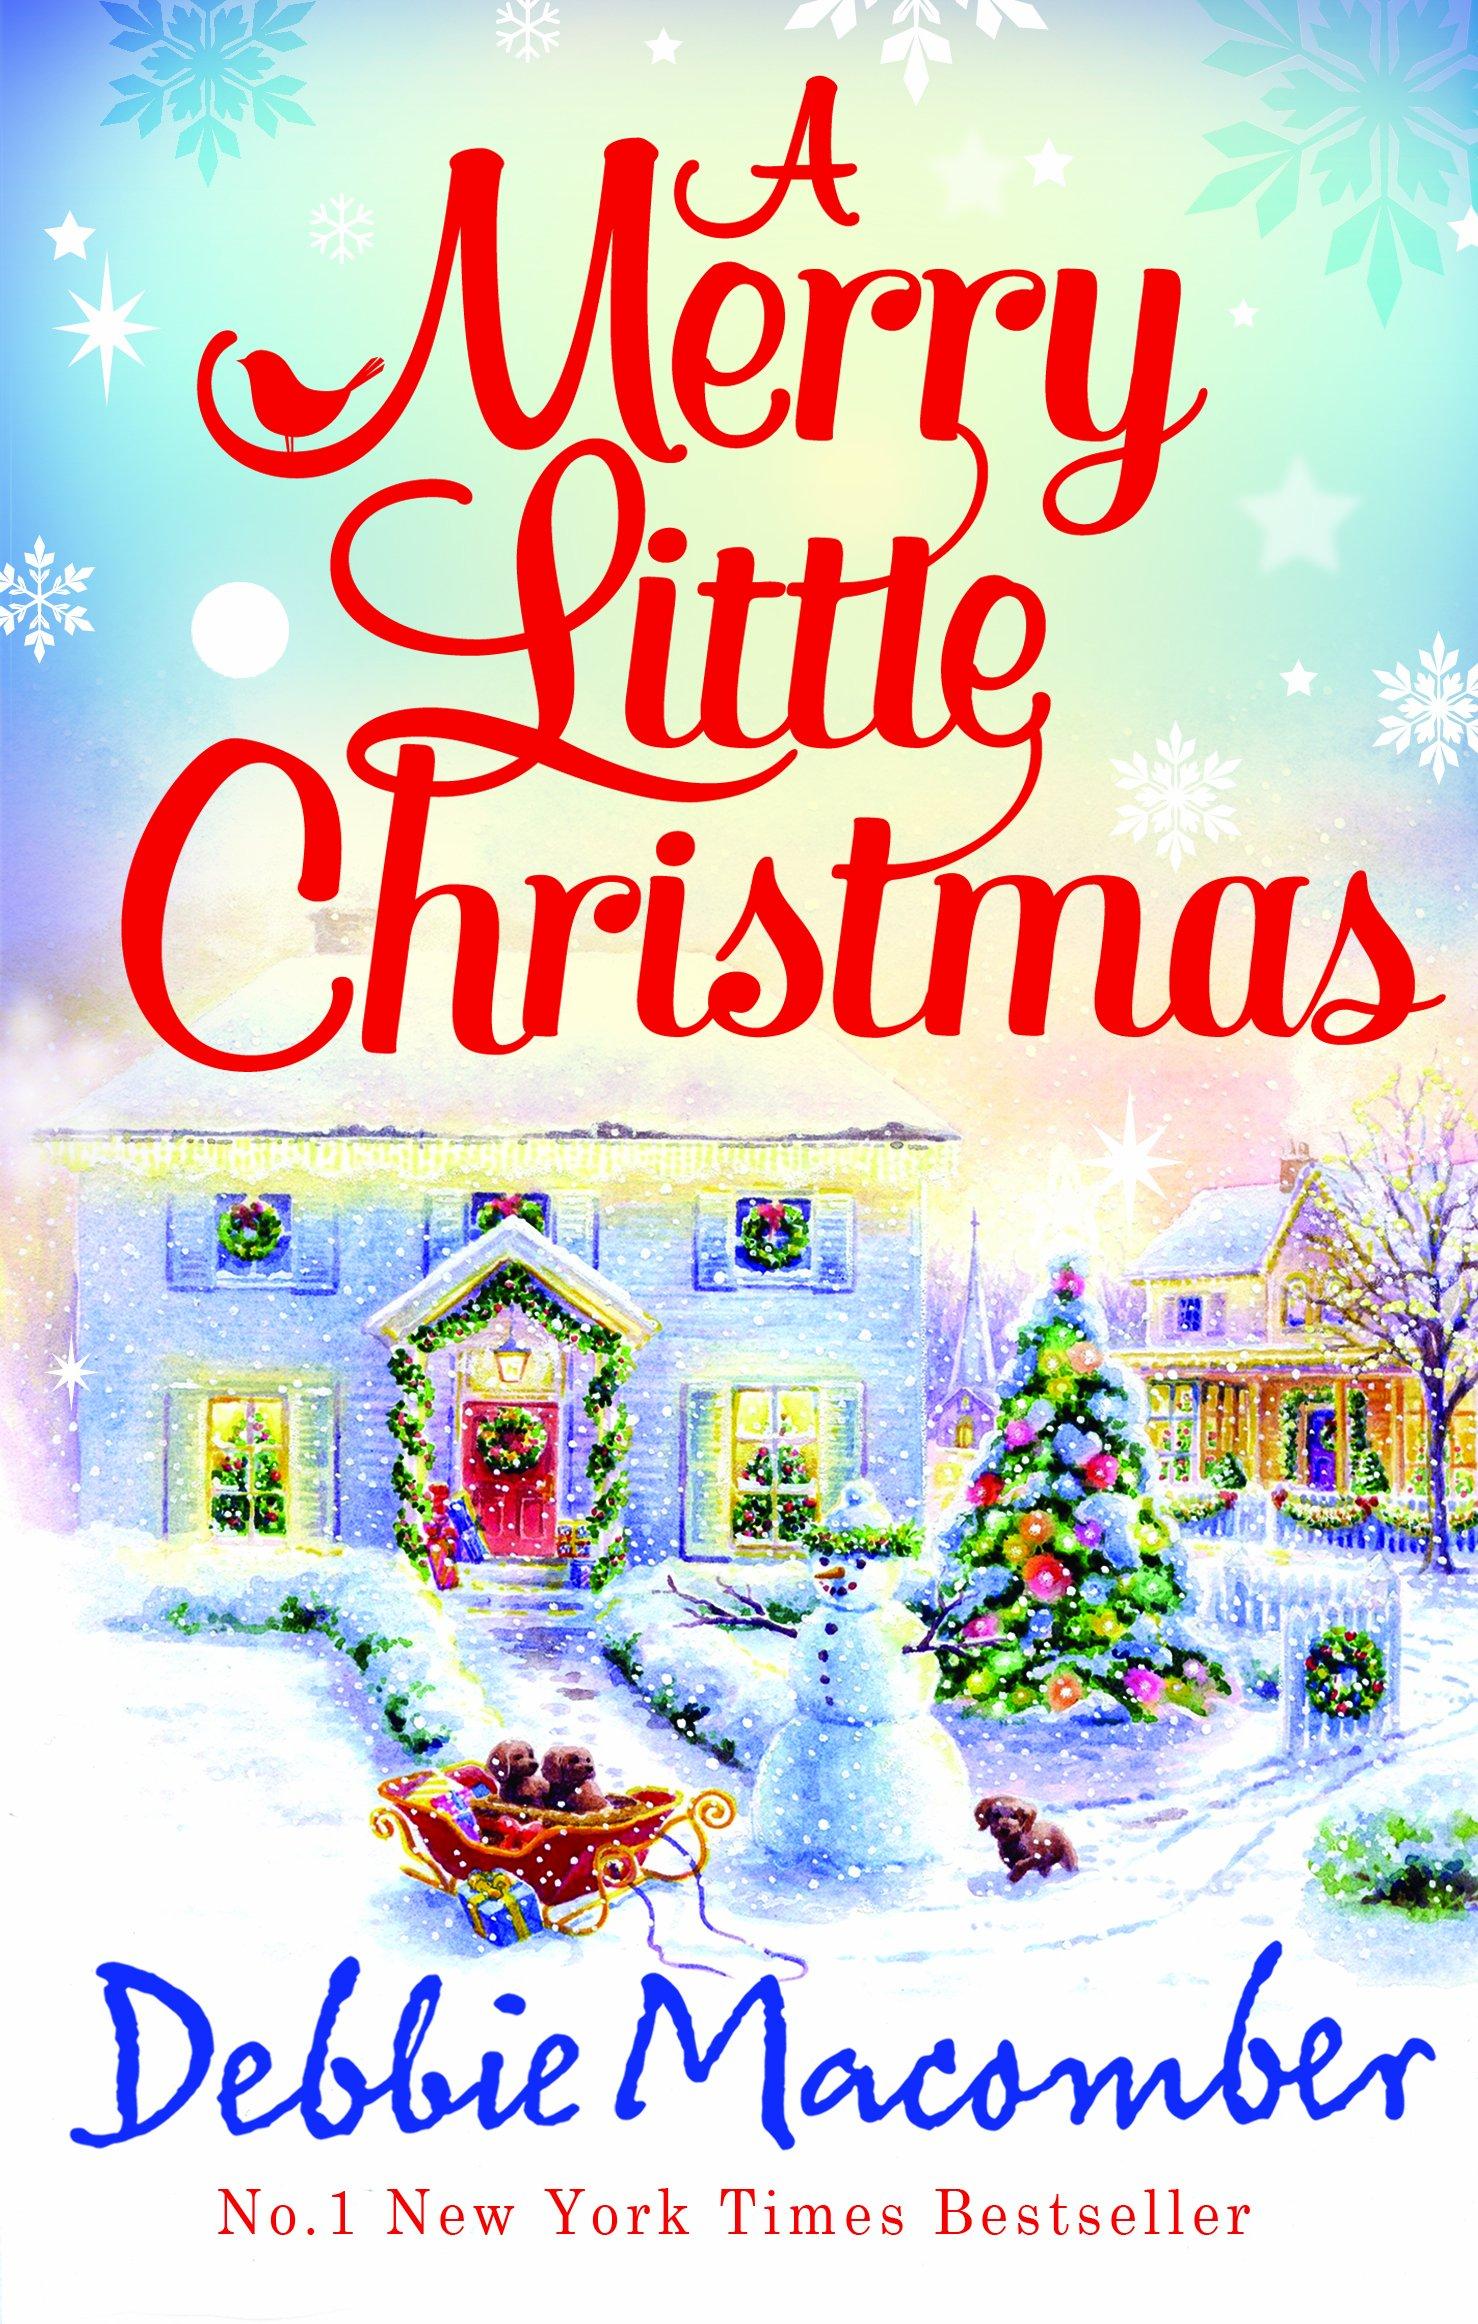 a merry little christmas 1225 christmas tree lane 5 b poppy lane debbie macomber 9781848451445 amazoncom books - Merry Little Christmas